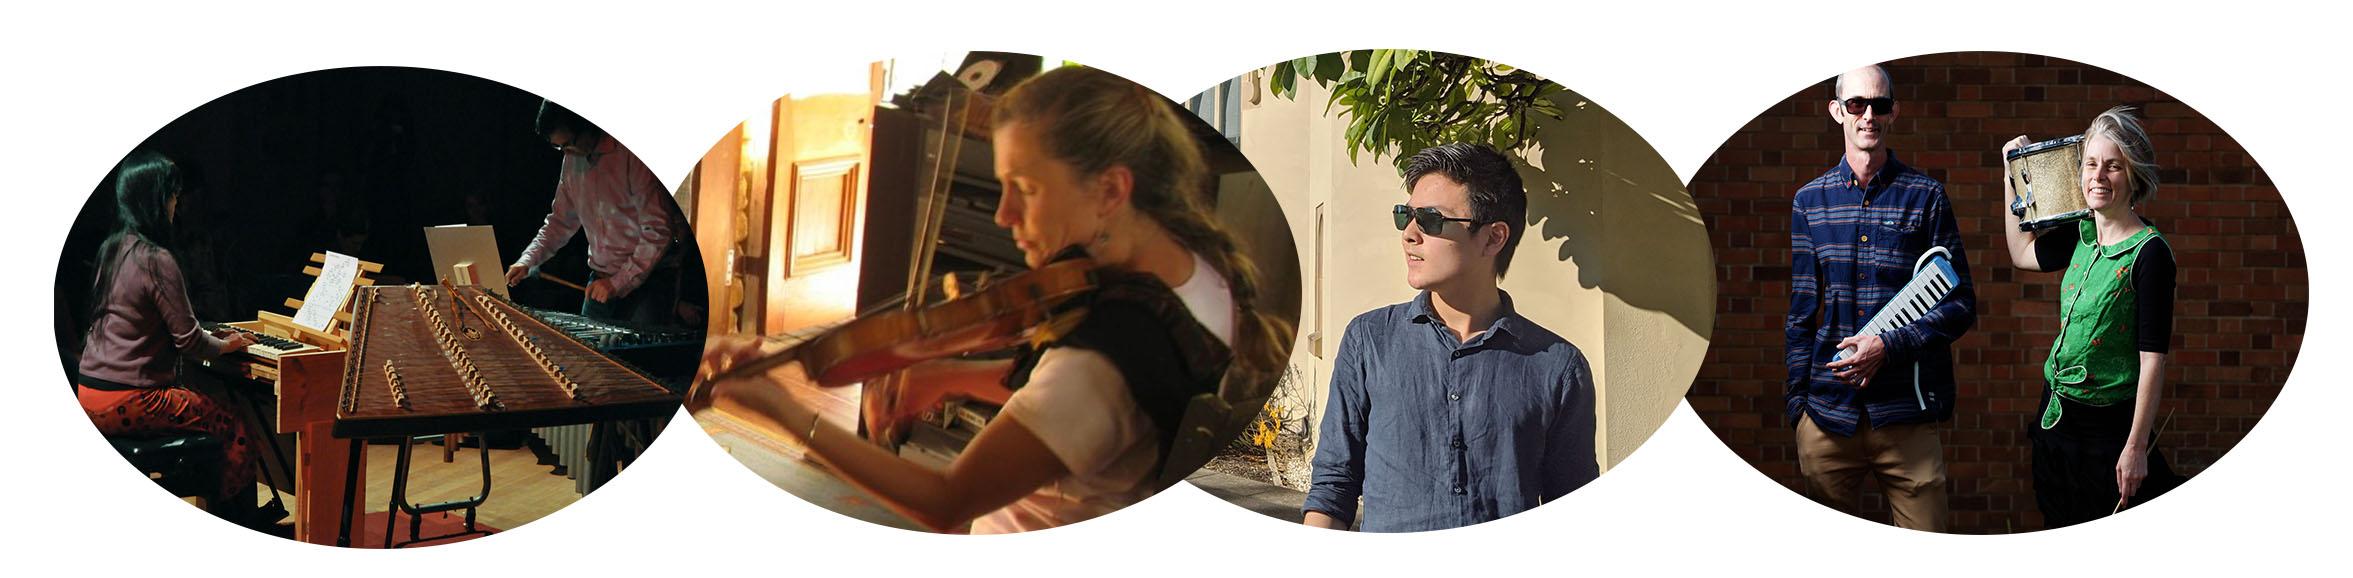 music forum concernt updated image